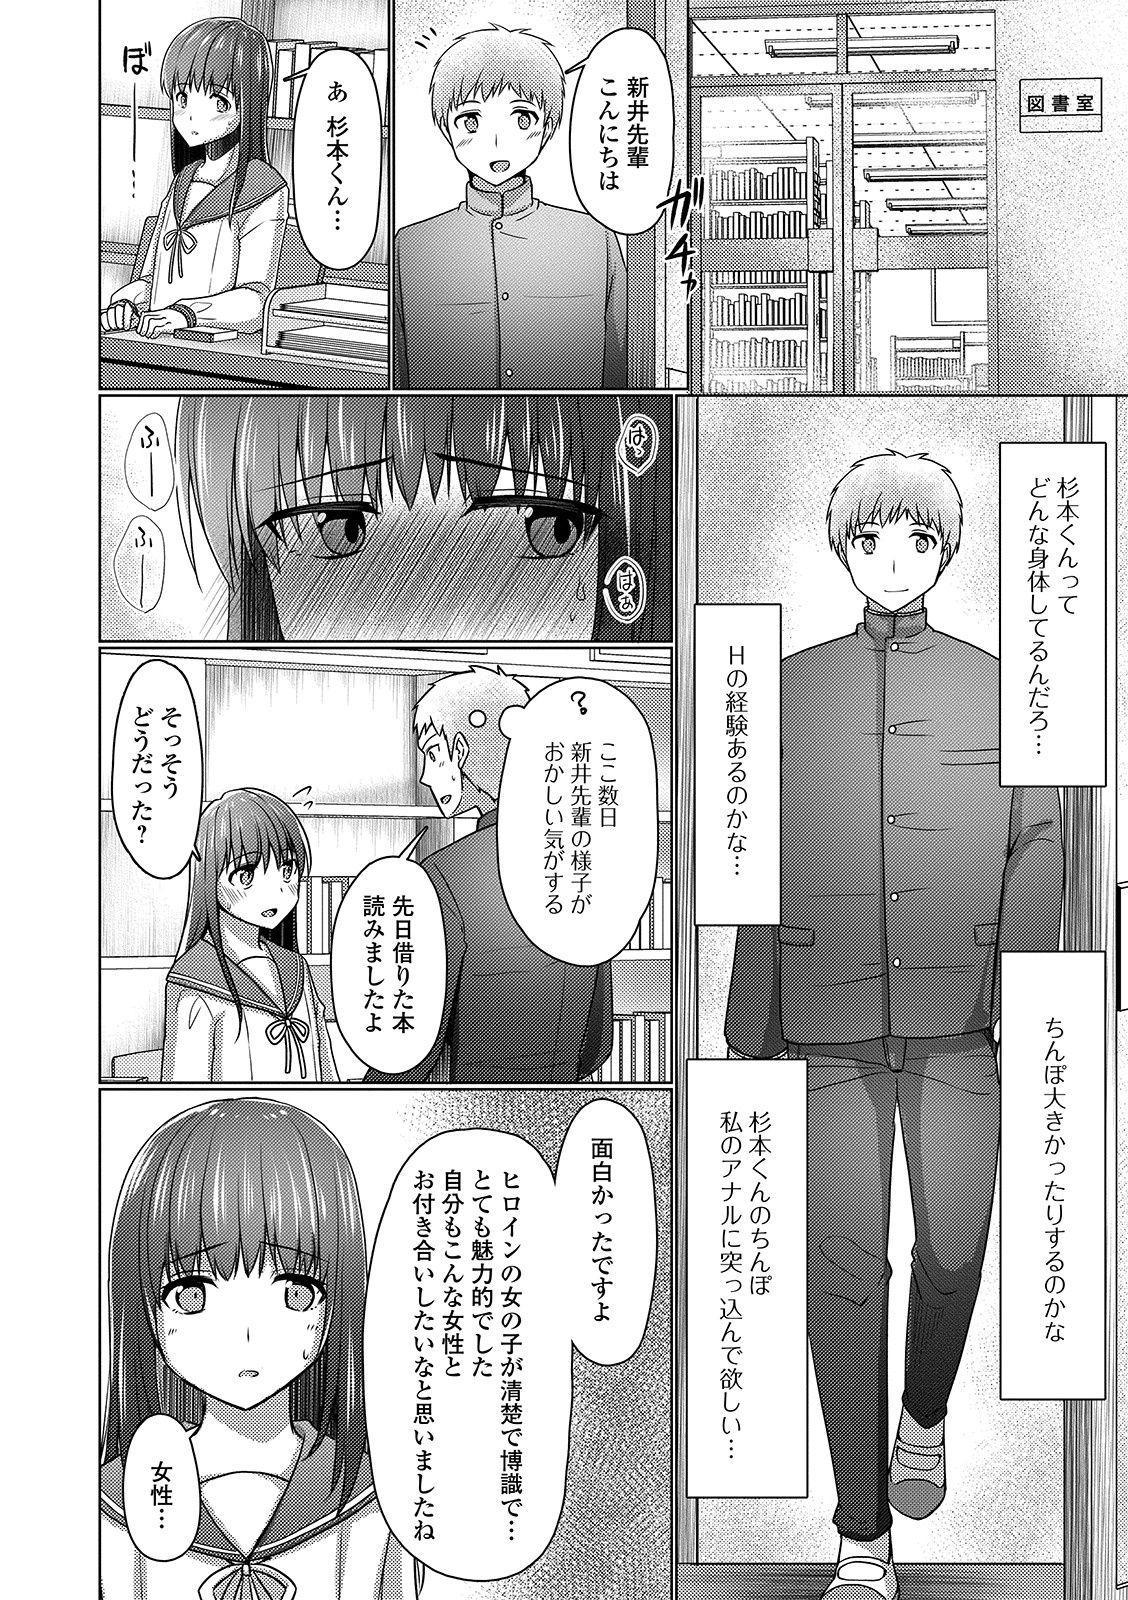 Gekkan Web Otoko no Ko-llection! S Vol. 43 53